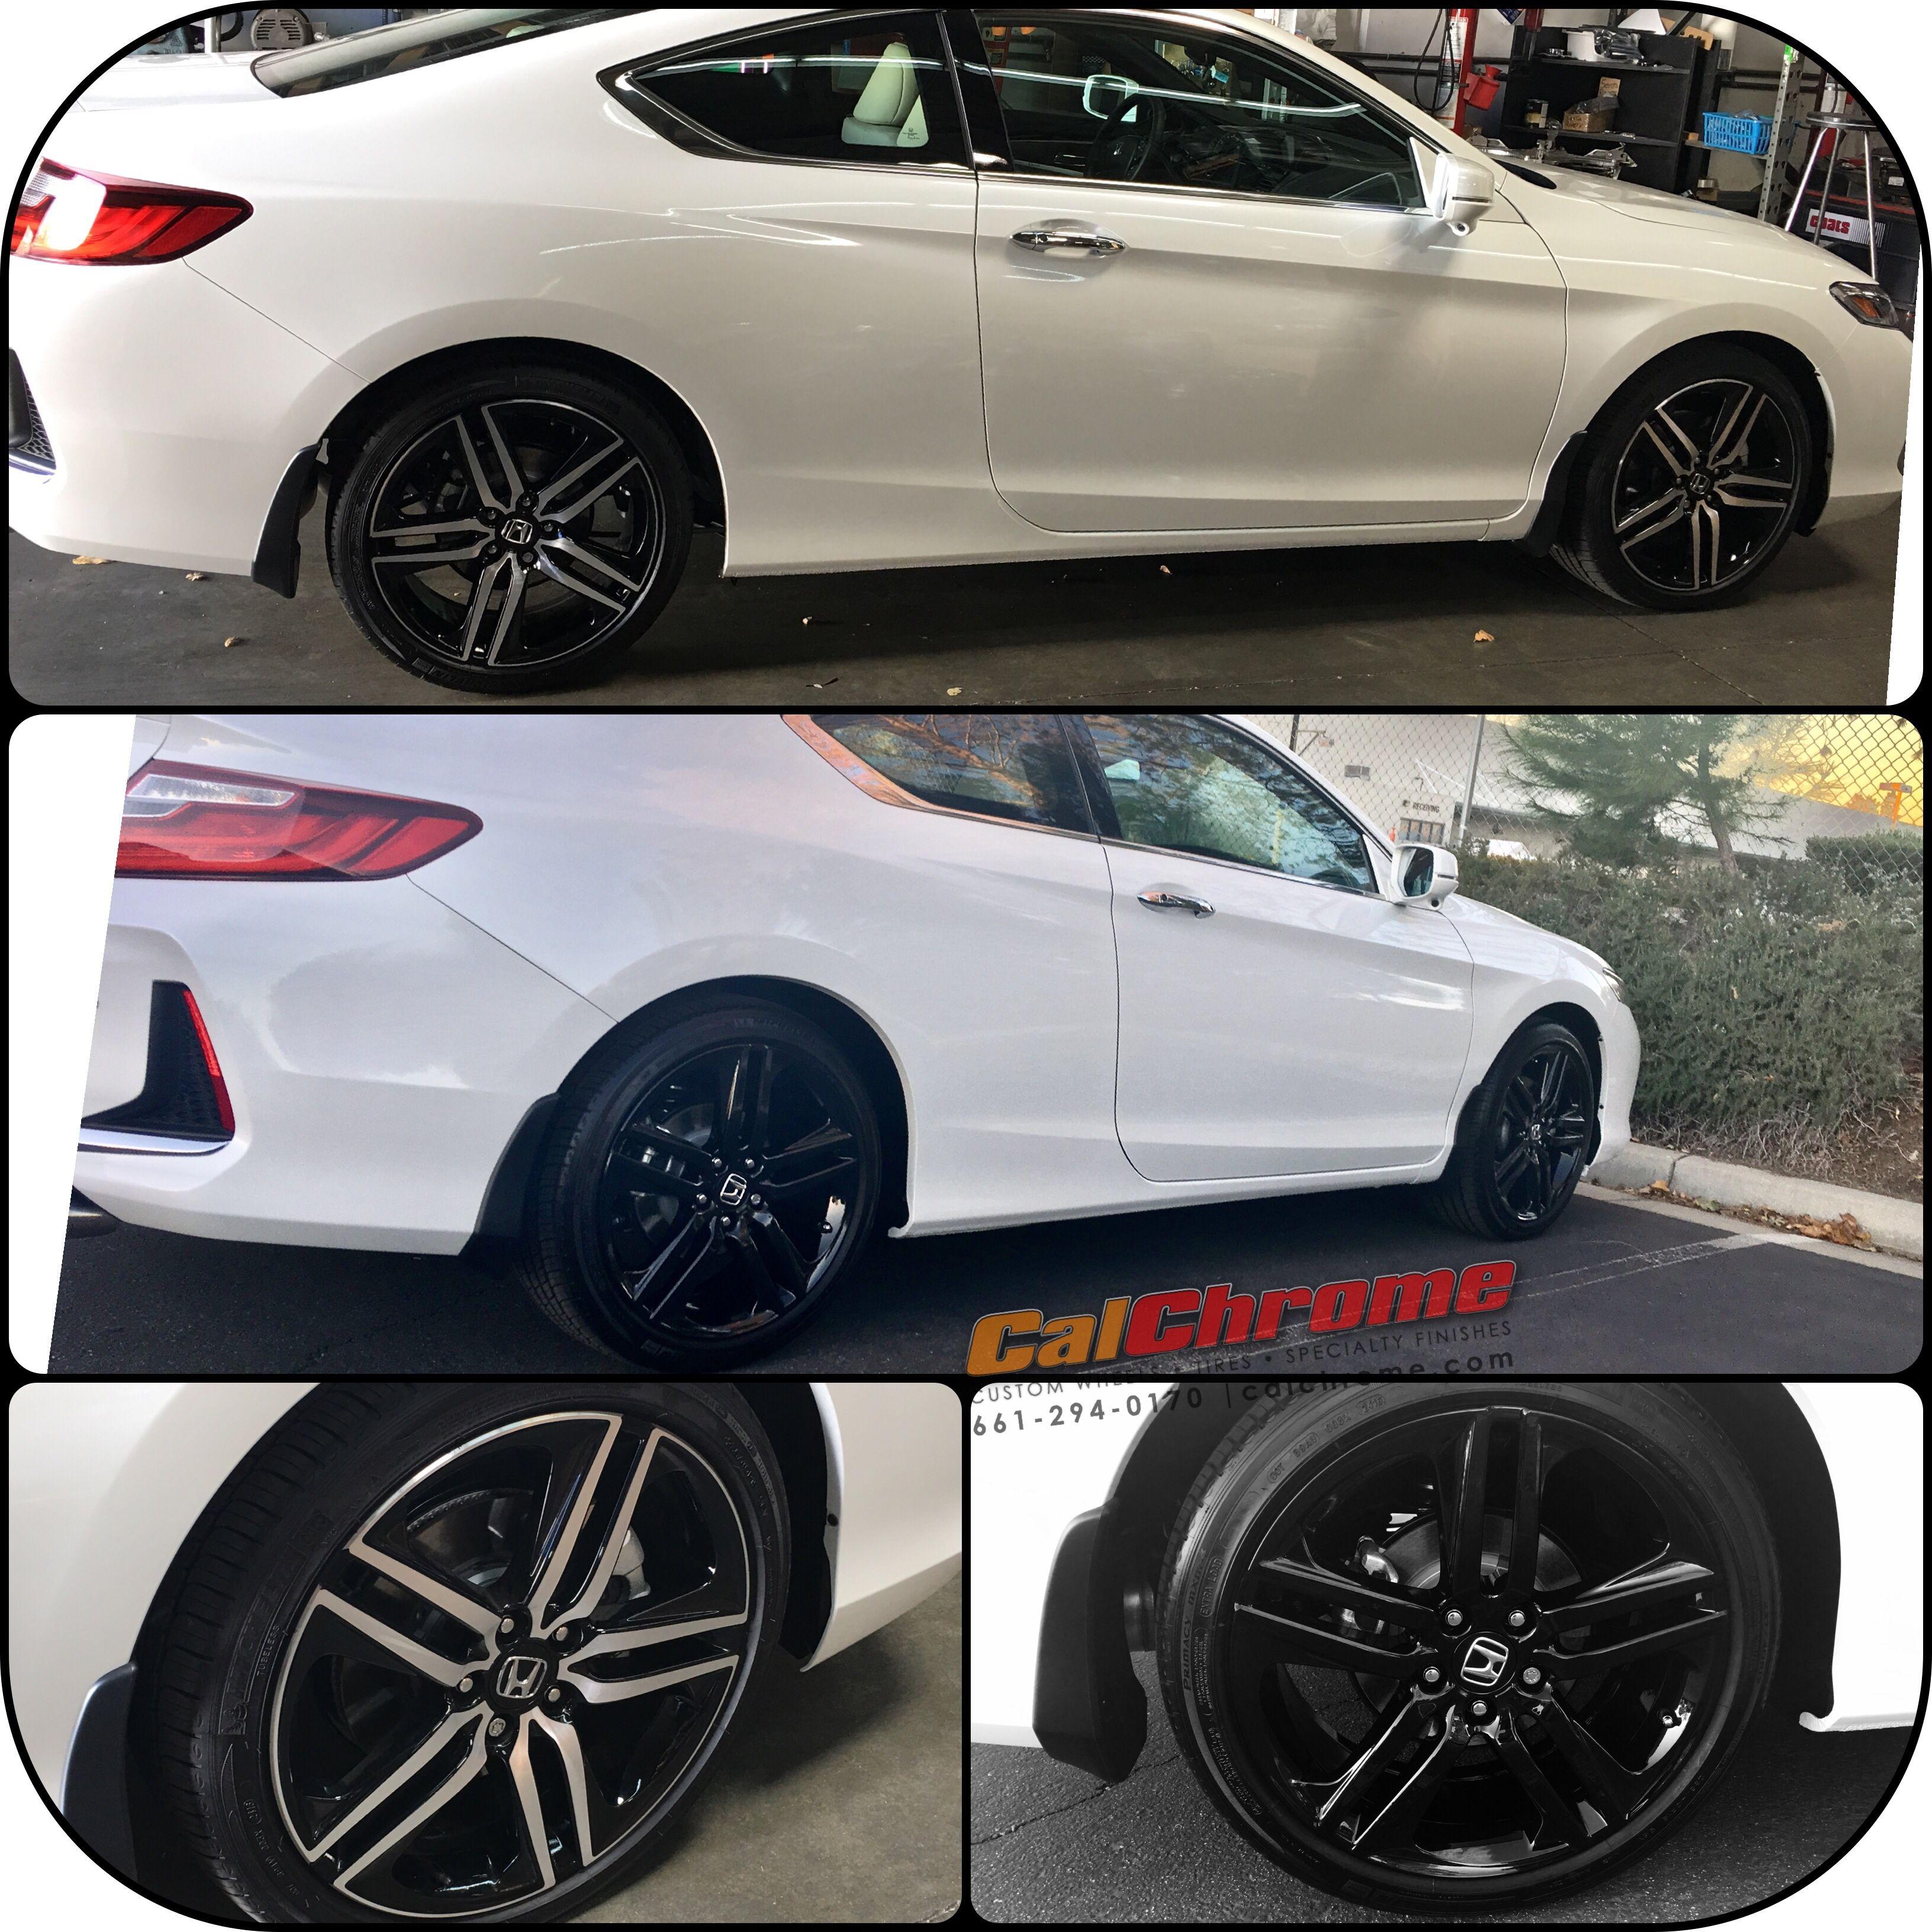 2016 honda accord sedan overview official site possible future cars pinterest honda accord sedans and honda